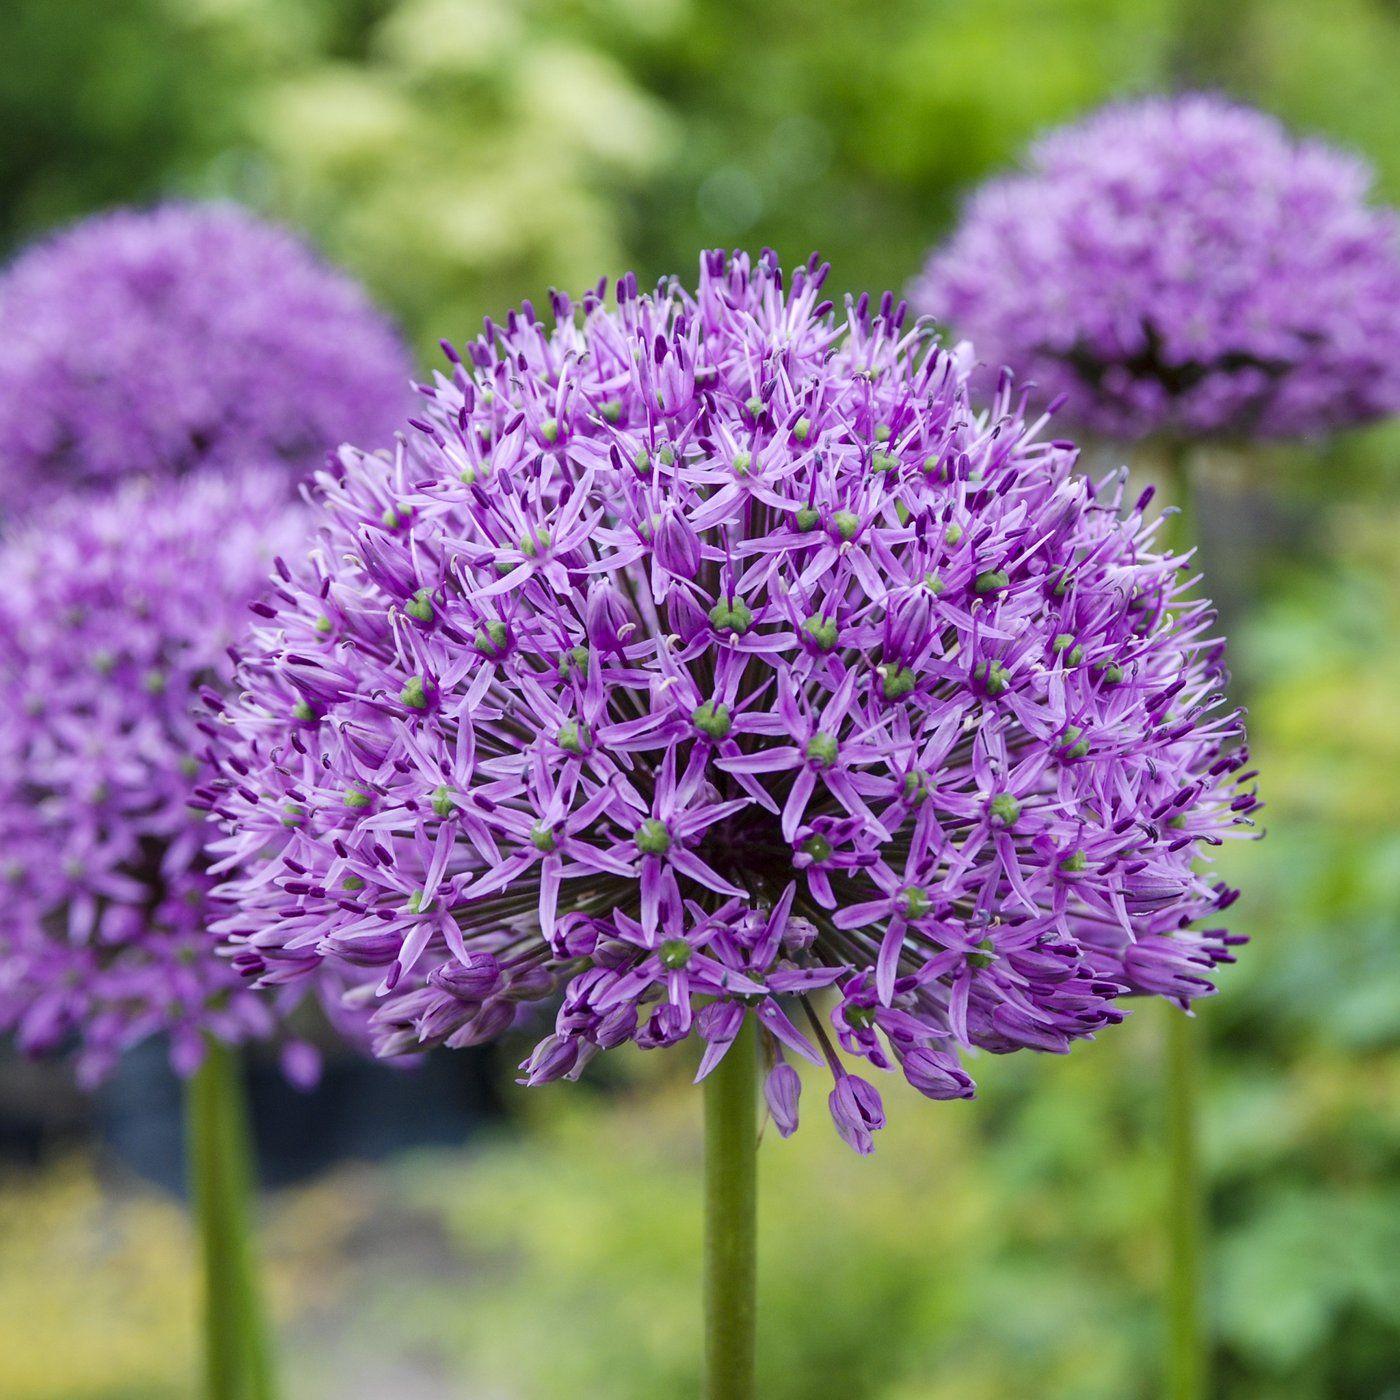 Allium Ampeloprasum Allium Flowers Easy To Grow Bulbs Flower Landscape